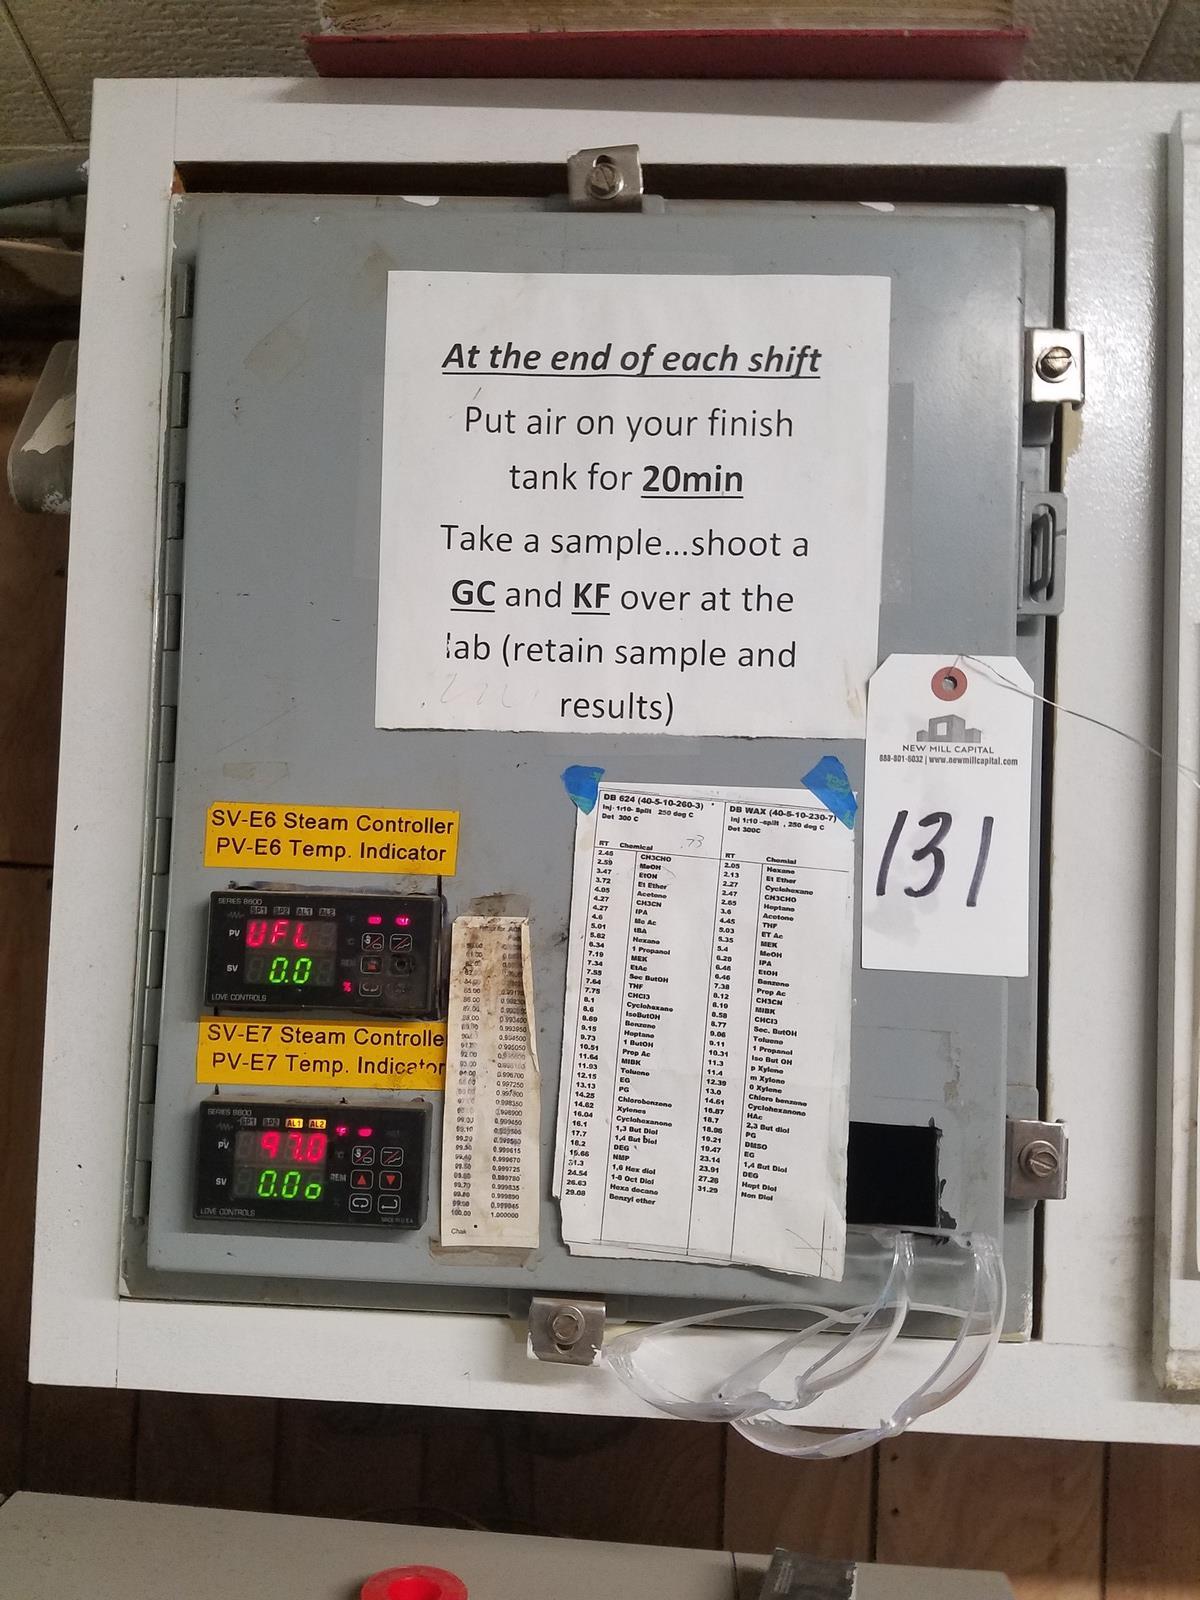 Lot 131 - Column Control Console | Rig Fee: $100